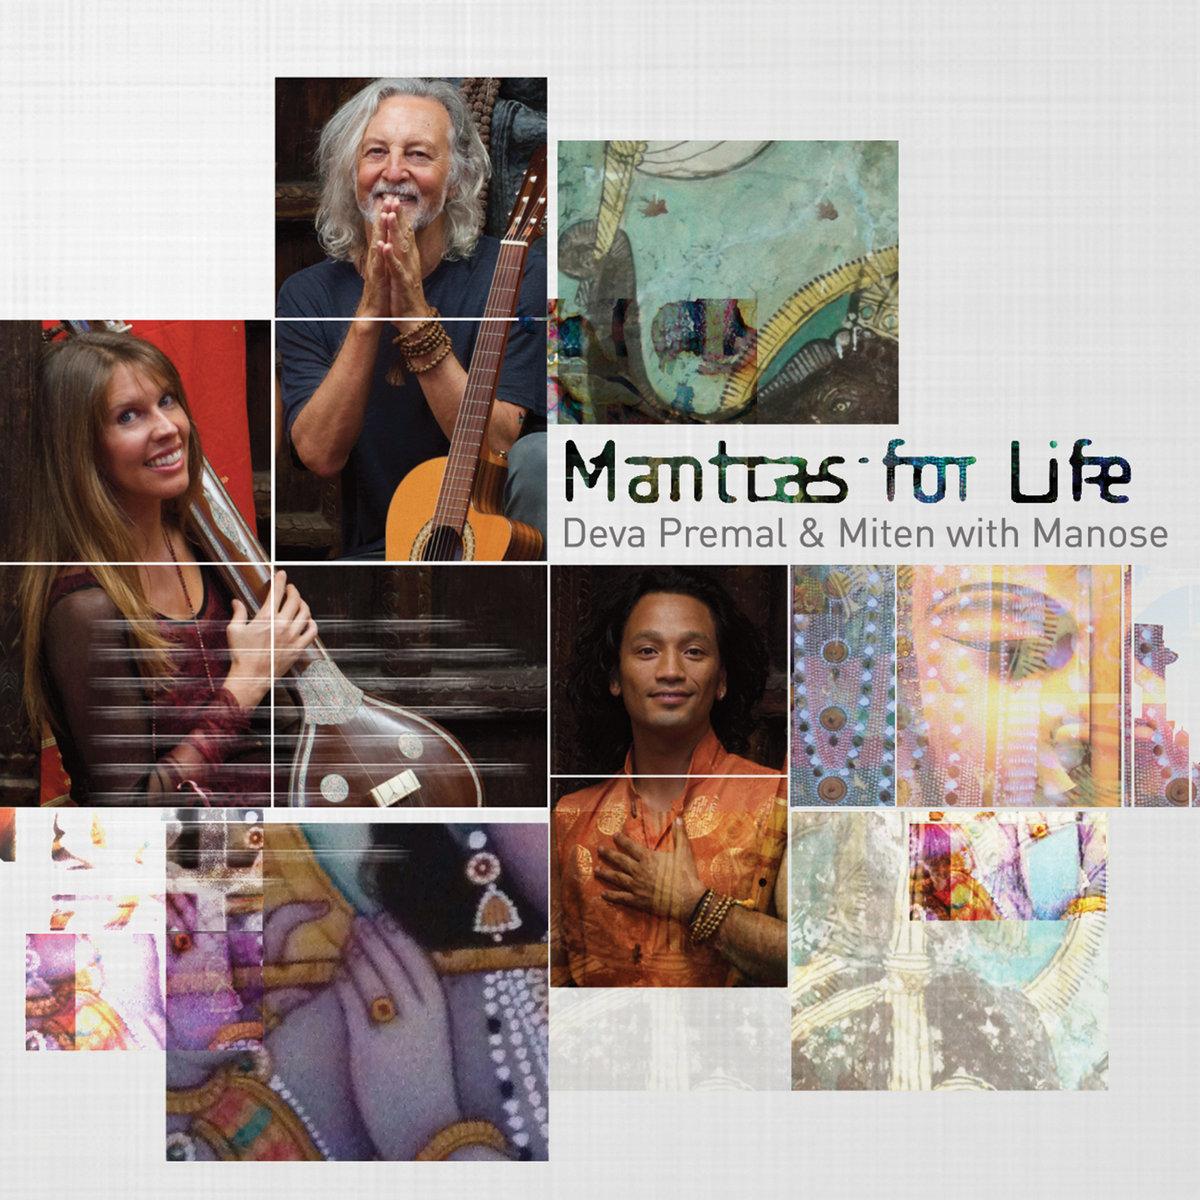 Om Sahana Vavatu Mantra Shanti Mantra White Swan Records